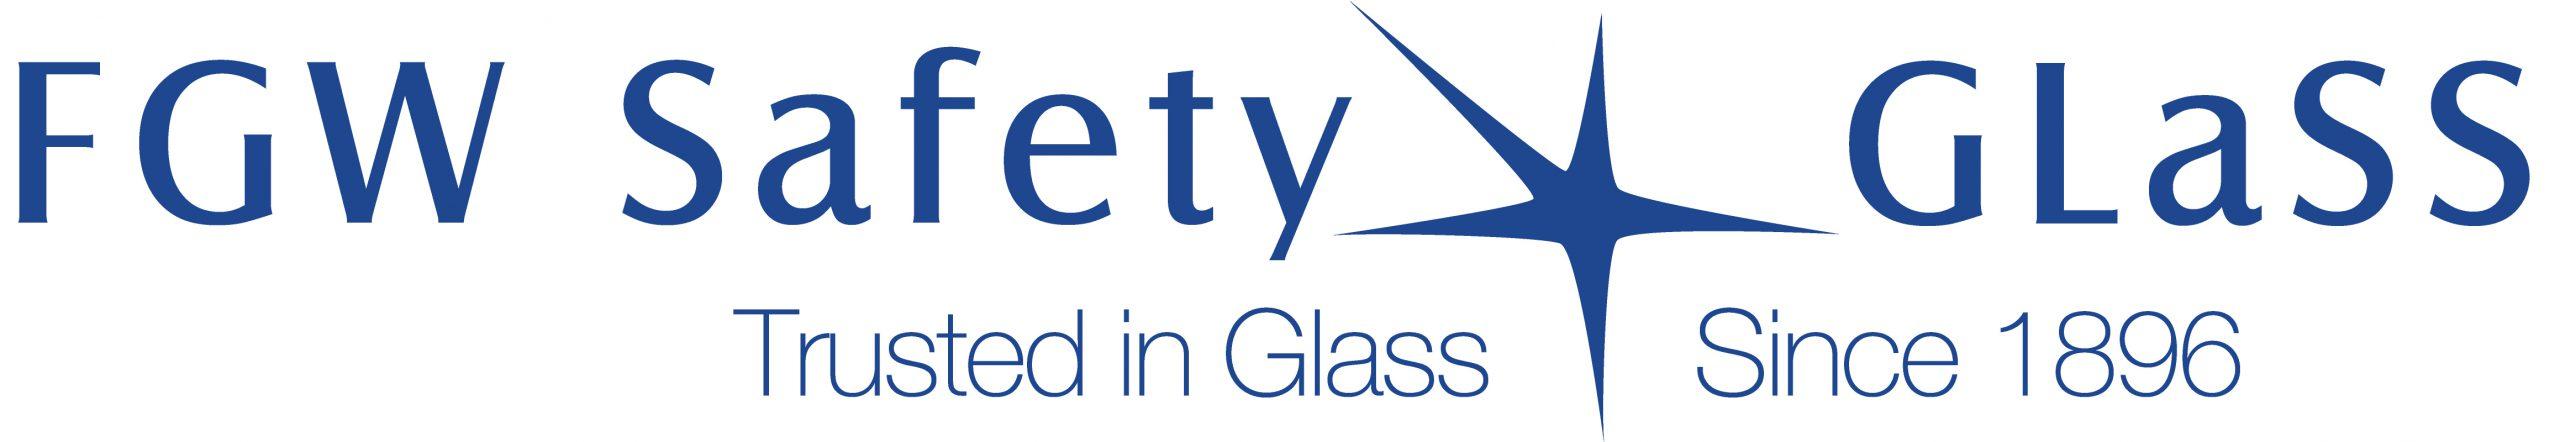 FGW Safety Glass